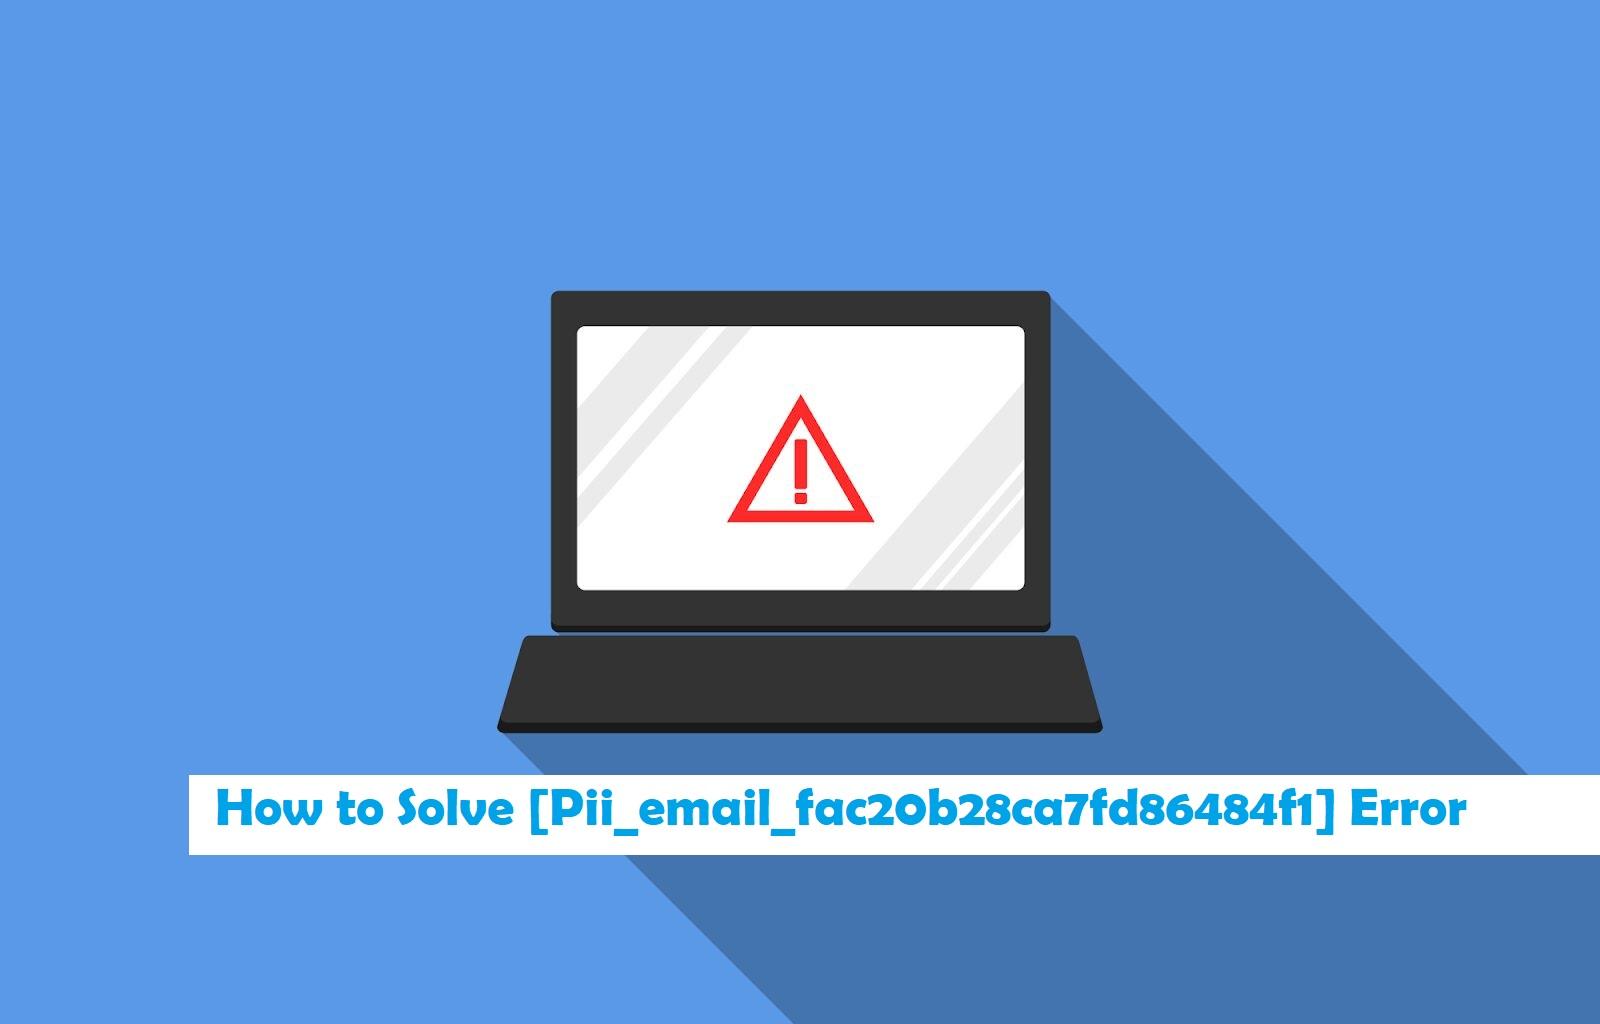 Outlook error fix [pii_email_fac20b28ca7fd86484f1]